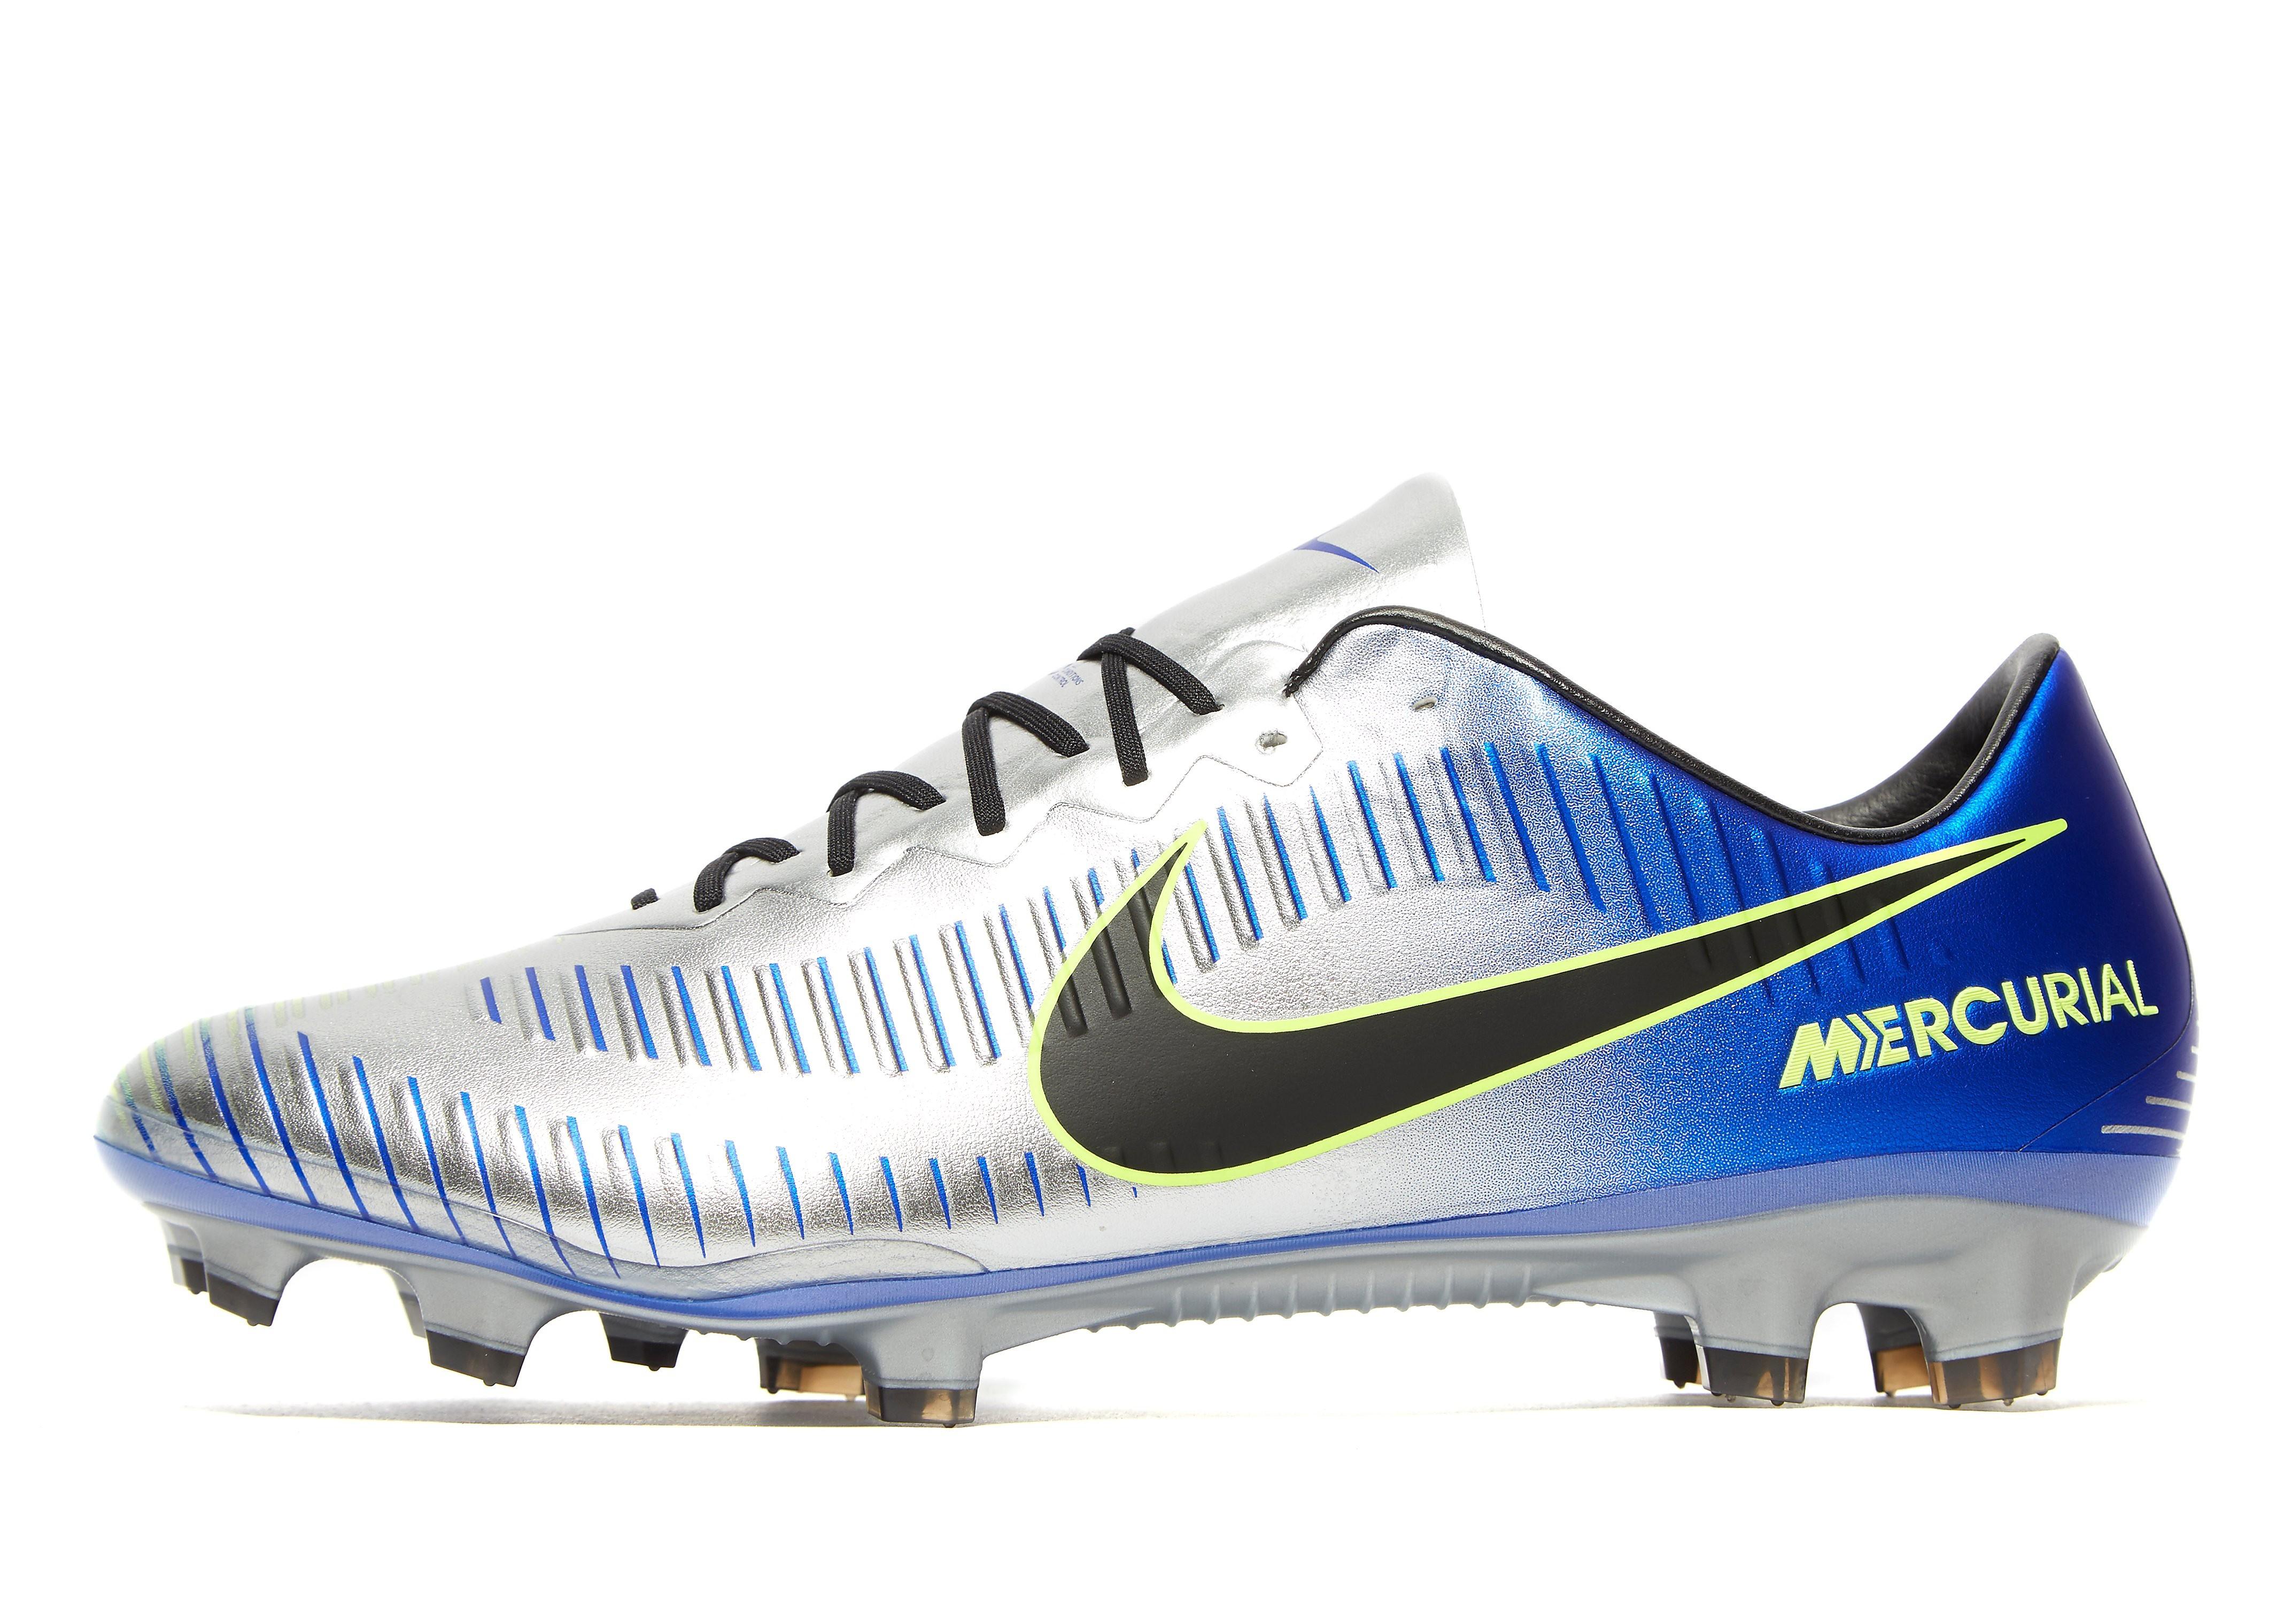 Nike Neymar Jr Mercurial Vapor XI FG